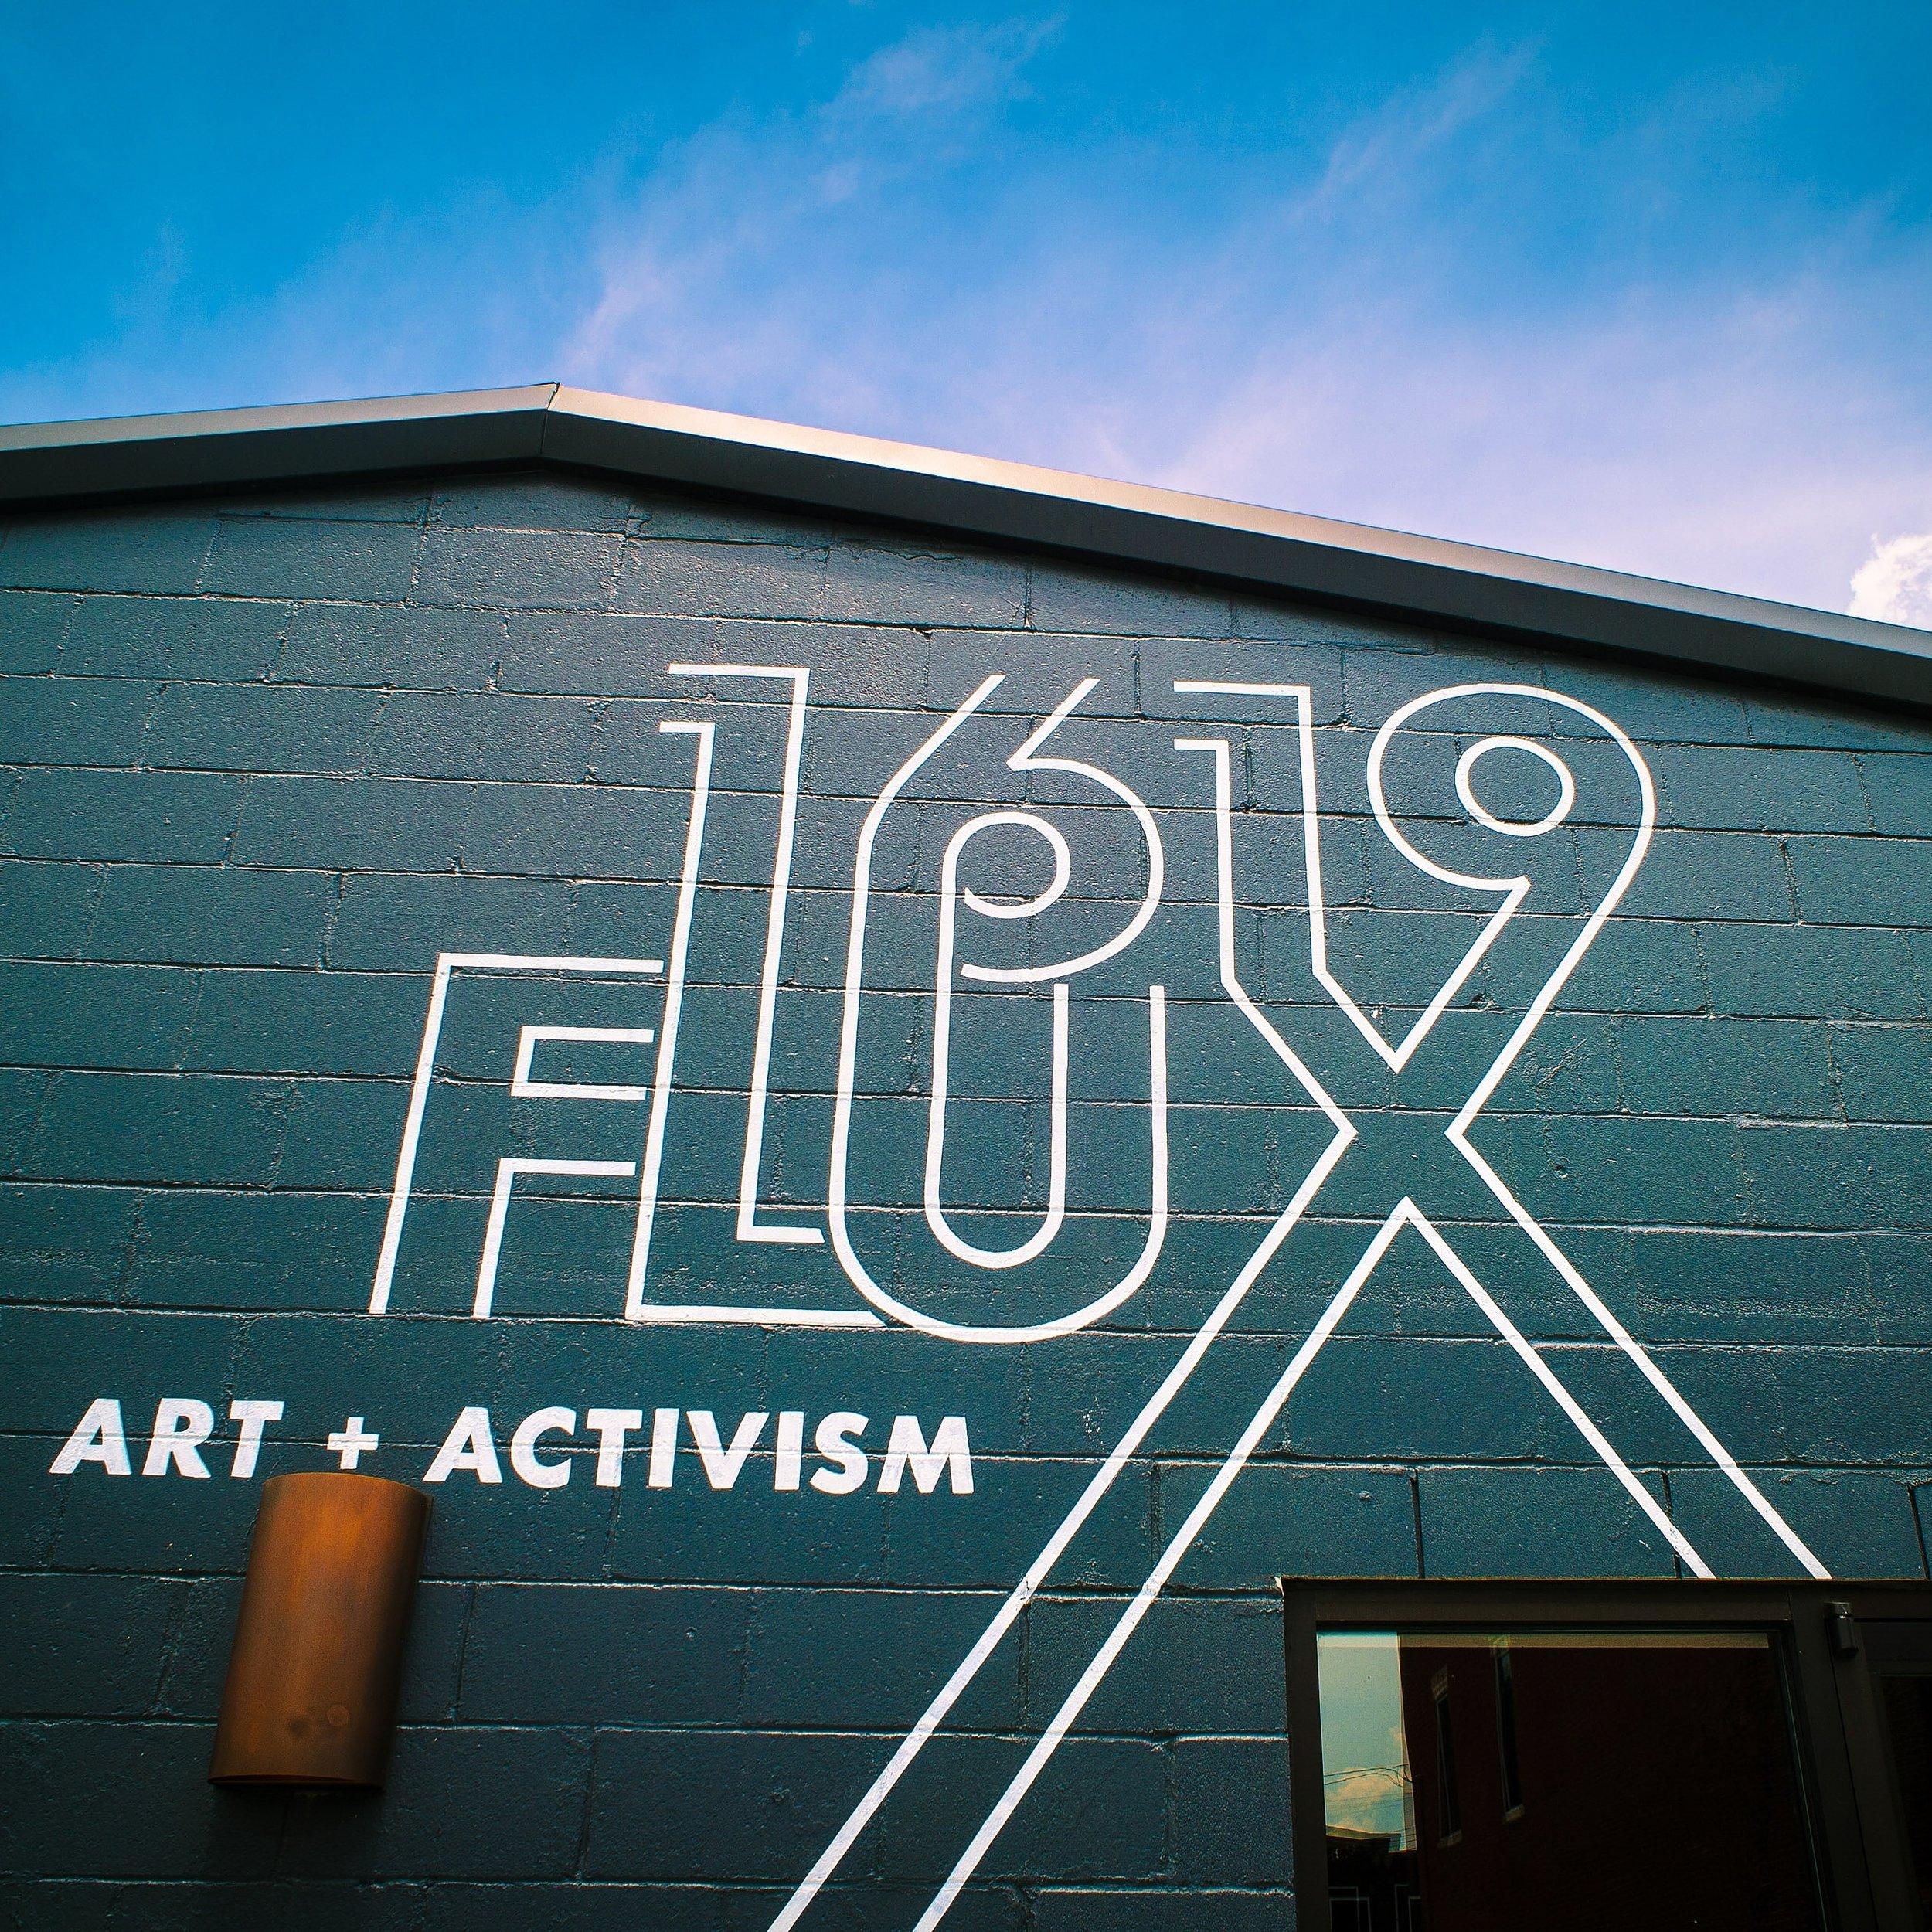 1619 Flux Art + Activism